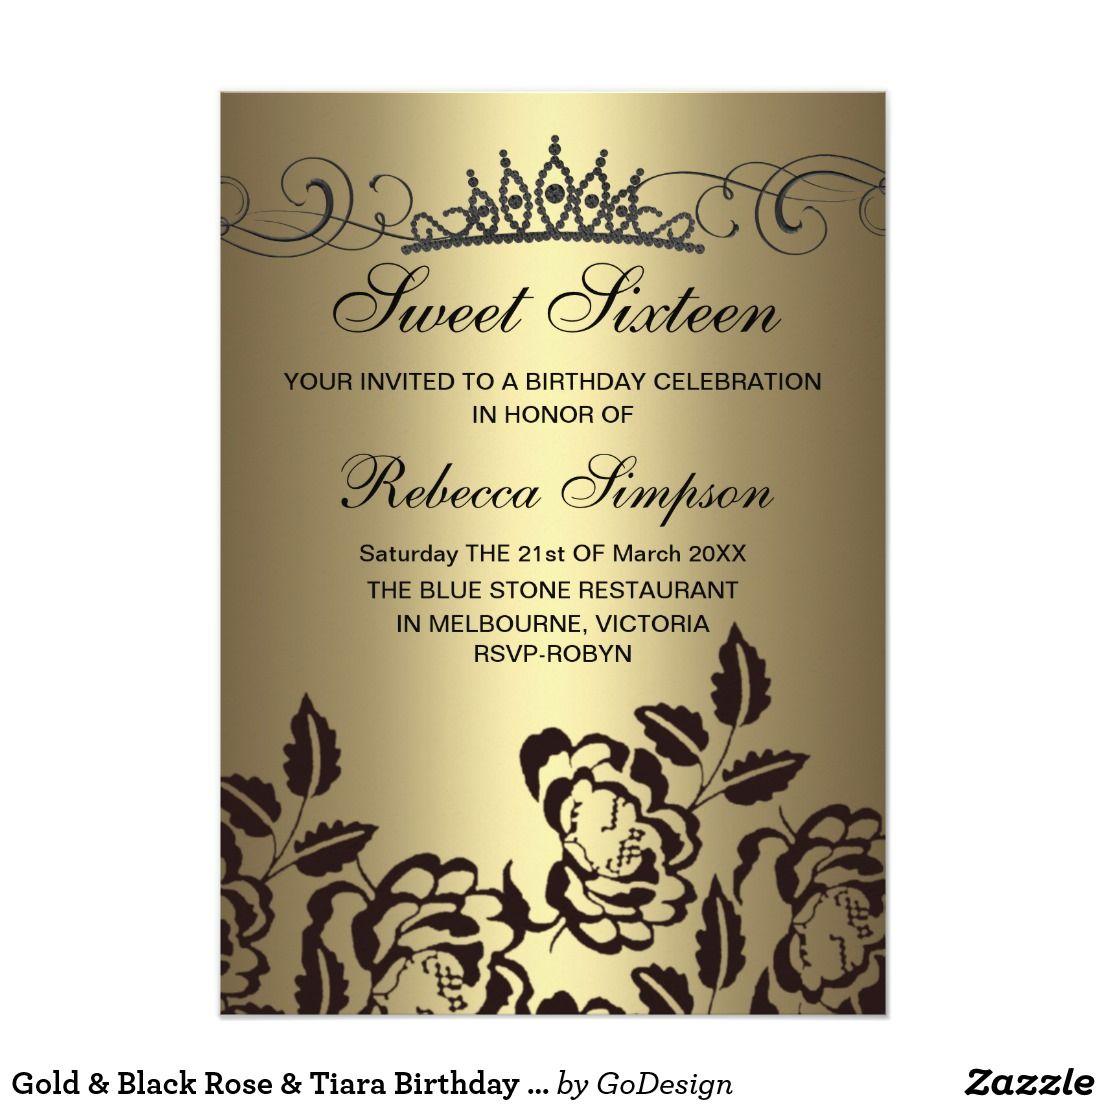 Gold & Black Rose & Tiara Birthday Invitation Elegant Gold & Black ...